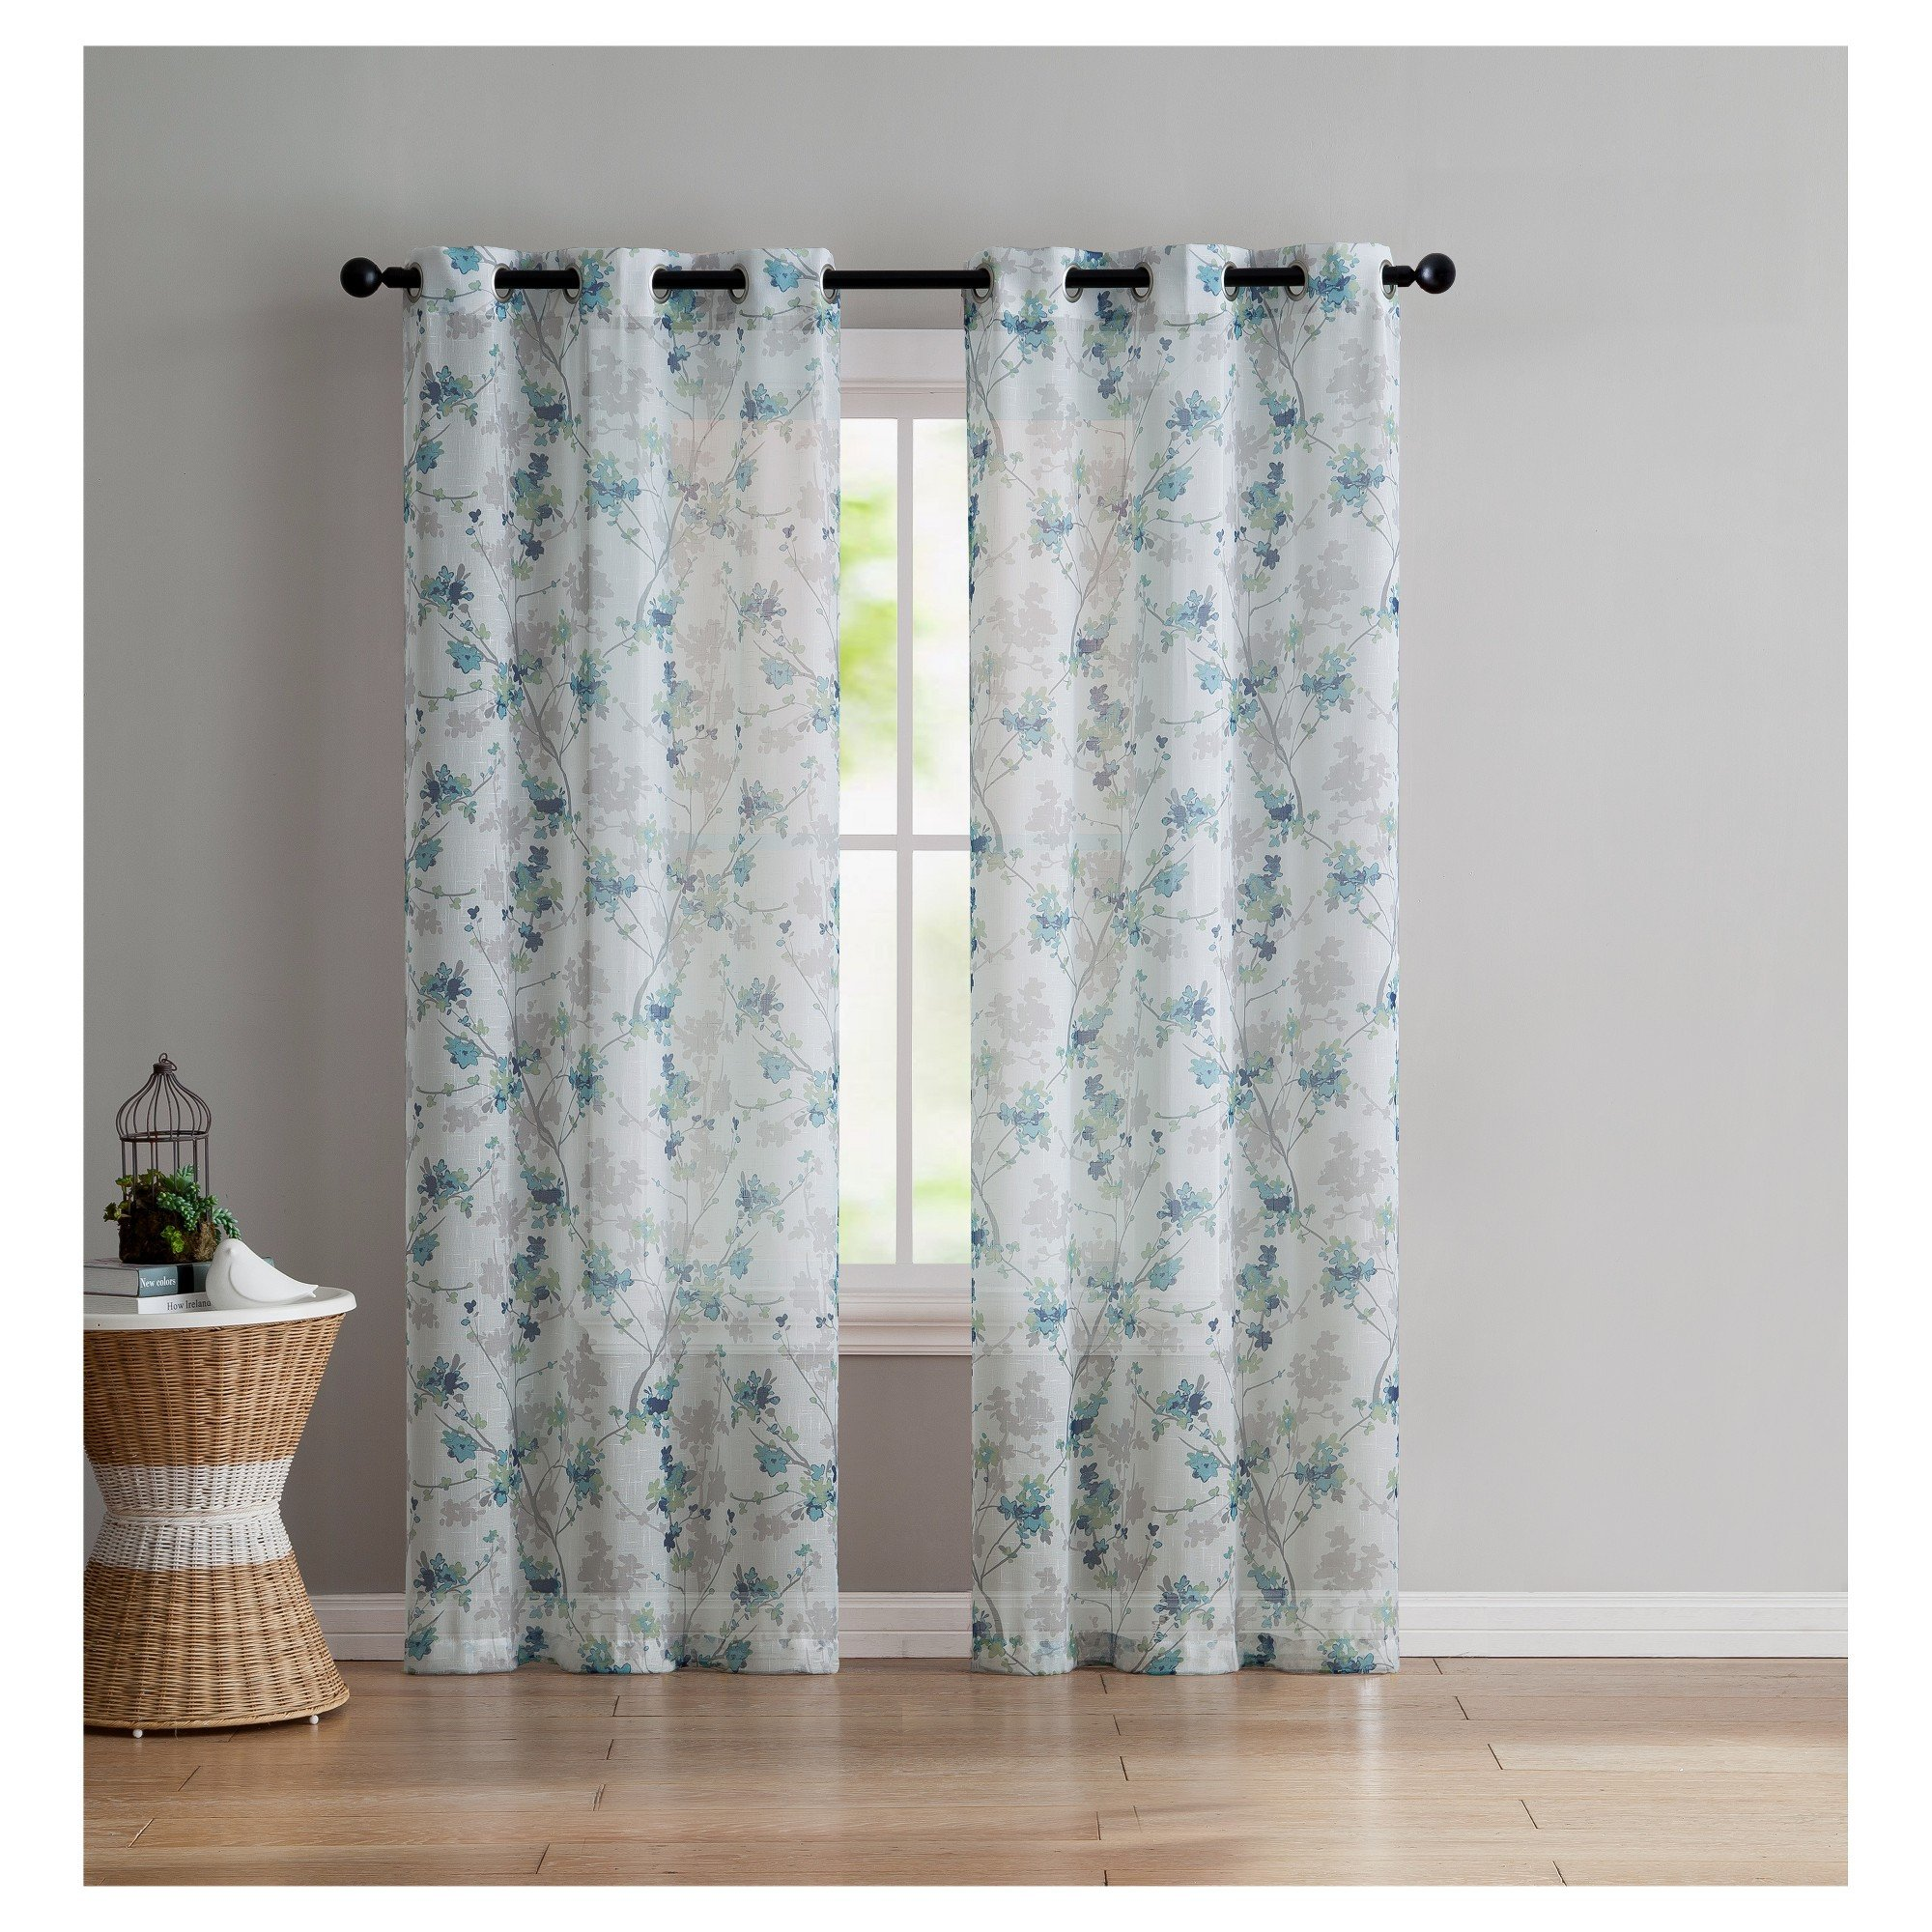 "Short Curtains for Bedroom Inspirational Jasmine Semi Window Sheer Aqua 38""x96"" Vcny Home Blue"